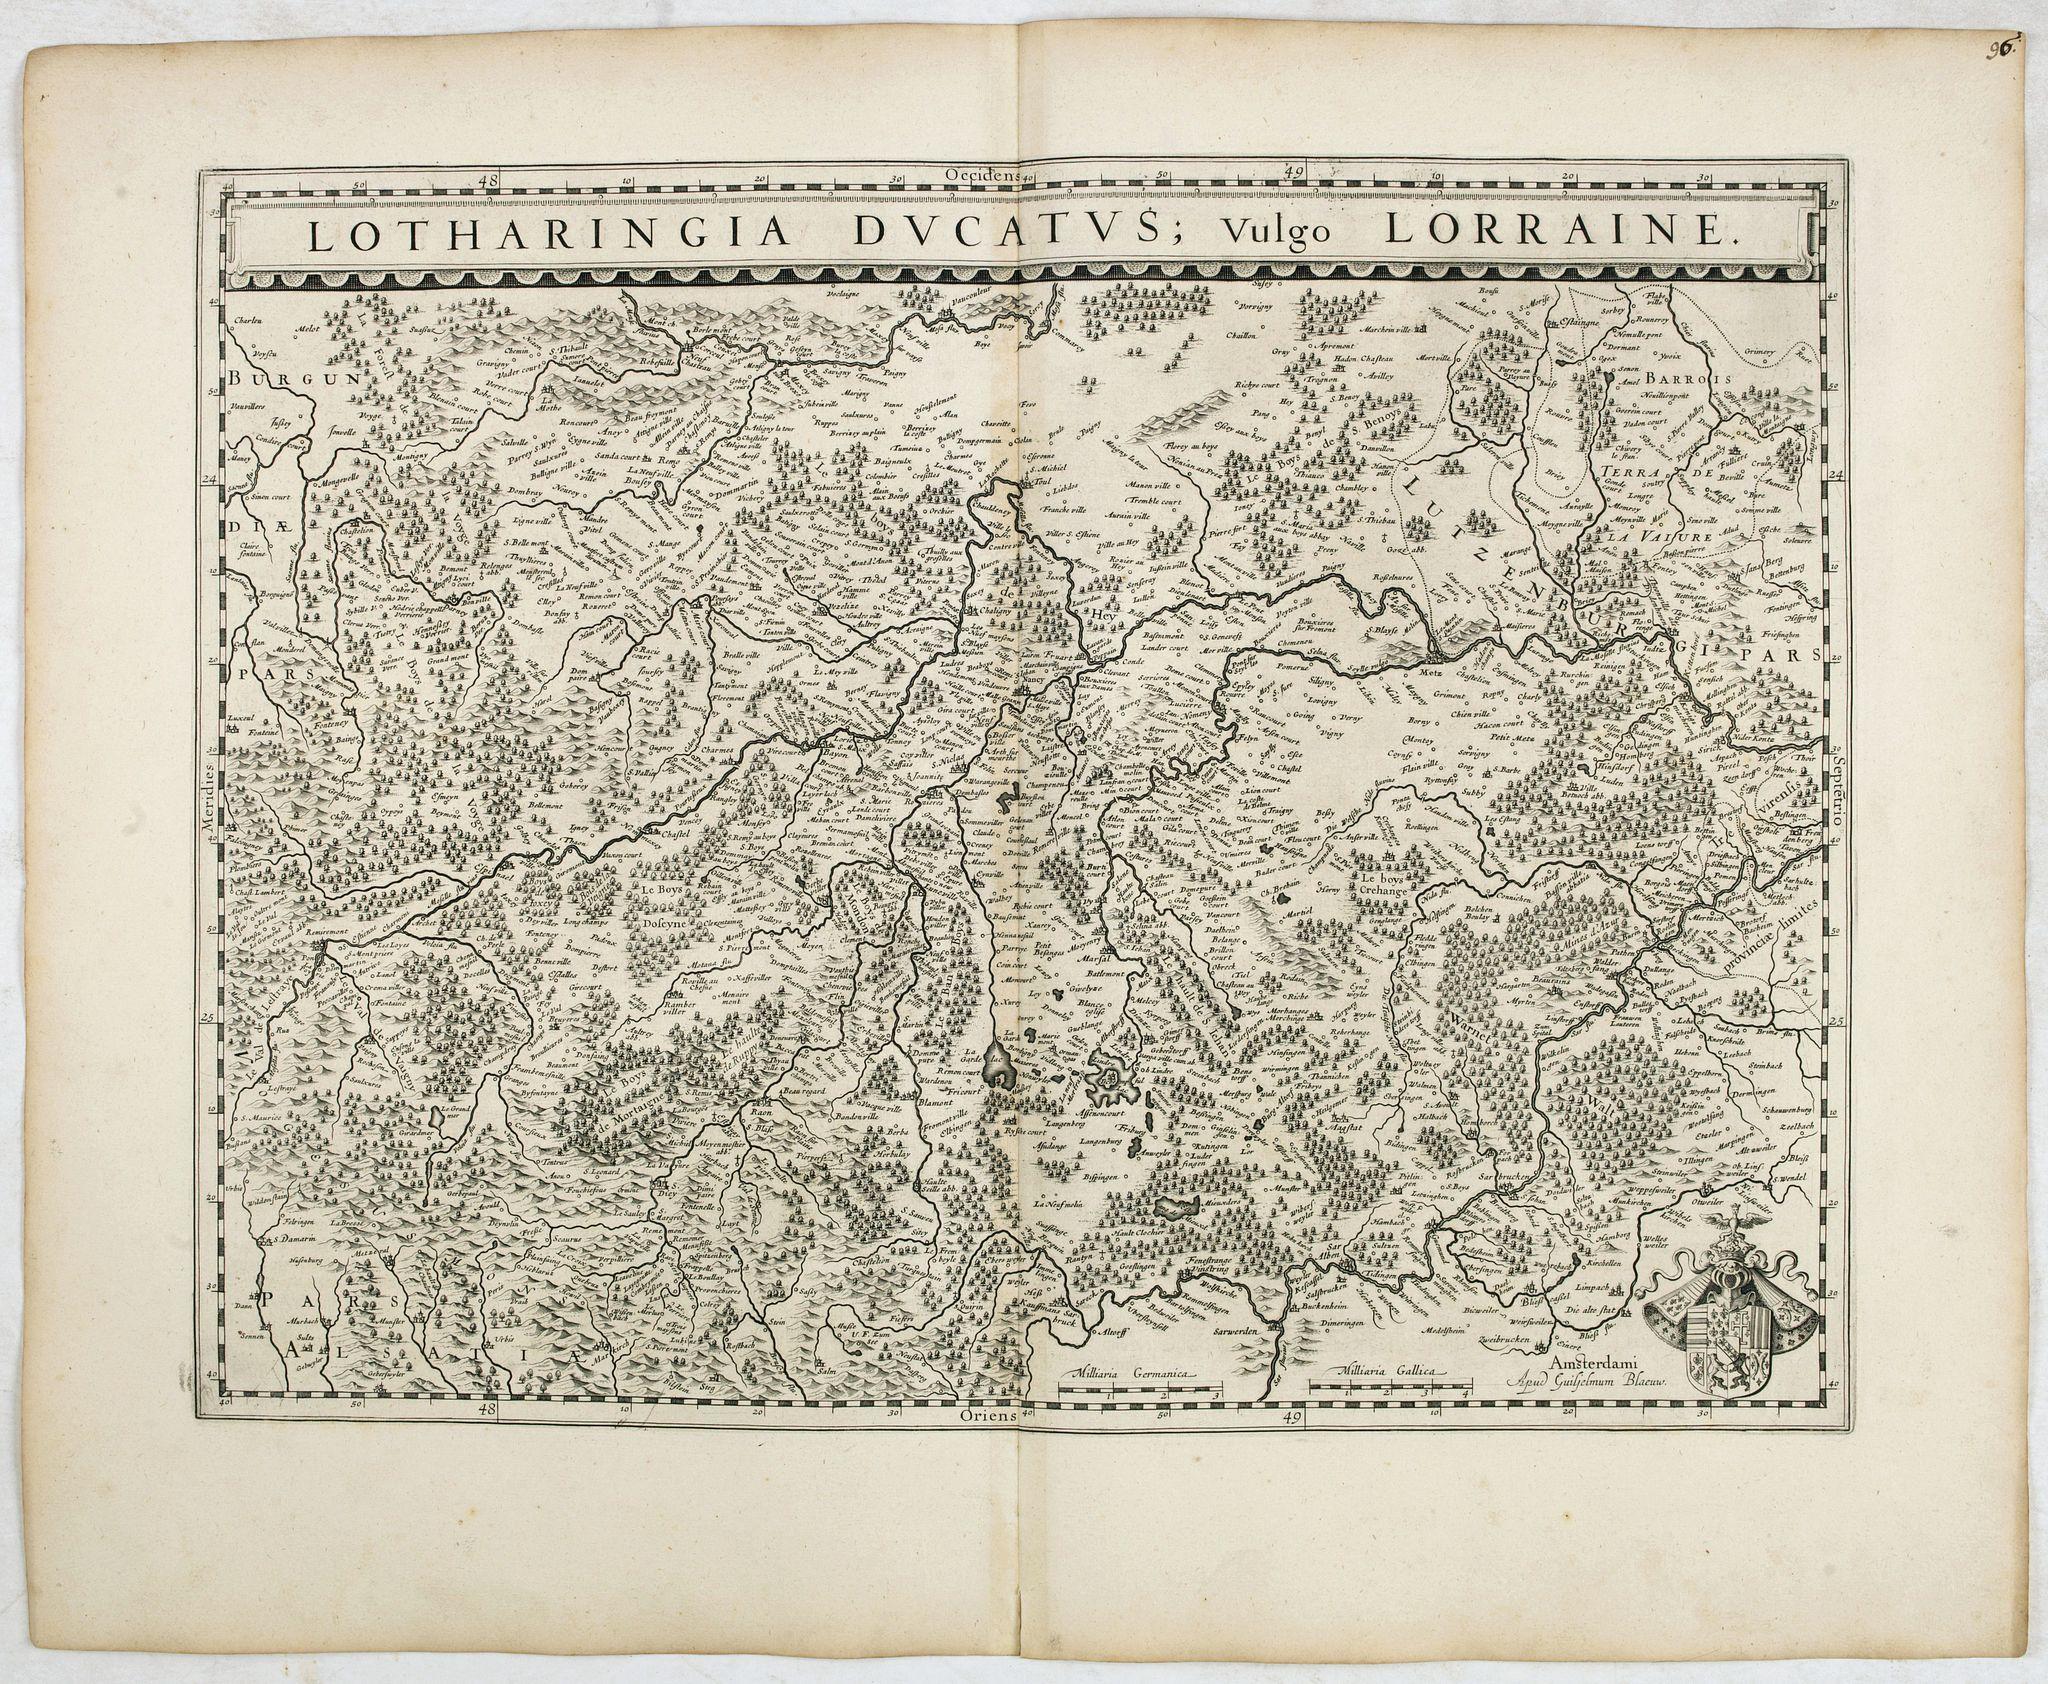 BLAEU, W. -  Lotharingia Ducatus:  Vulgo Lorraine.